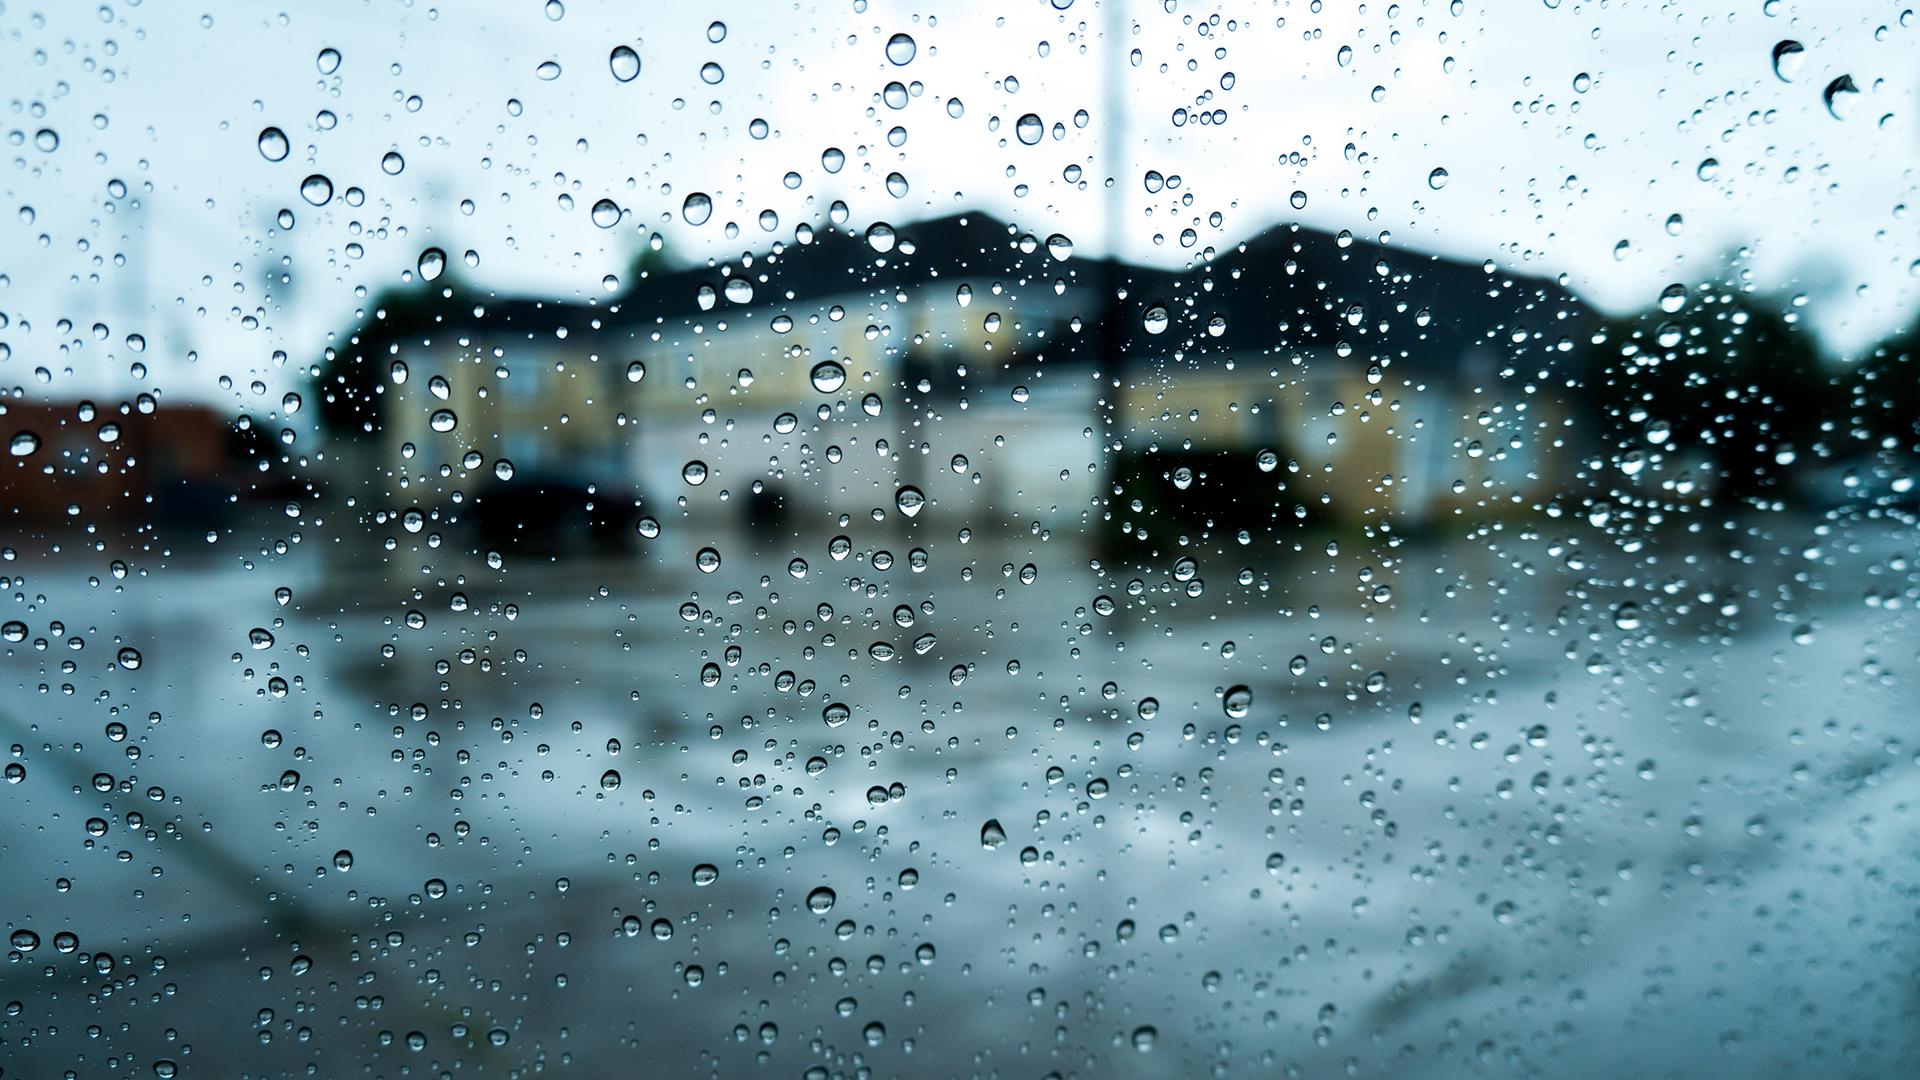 Rain Full Hd Wallpaper And Background 1920x1080 Id 415520